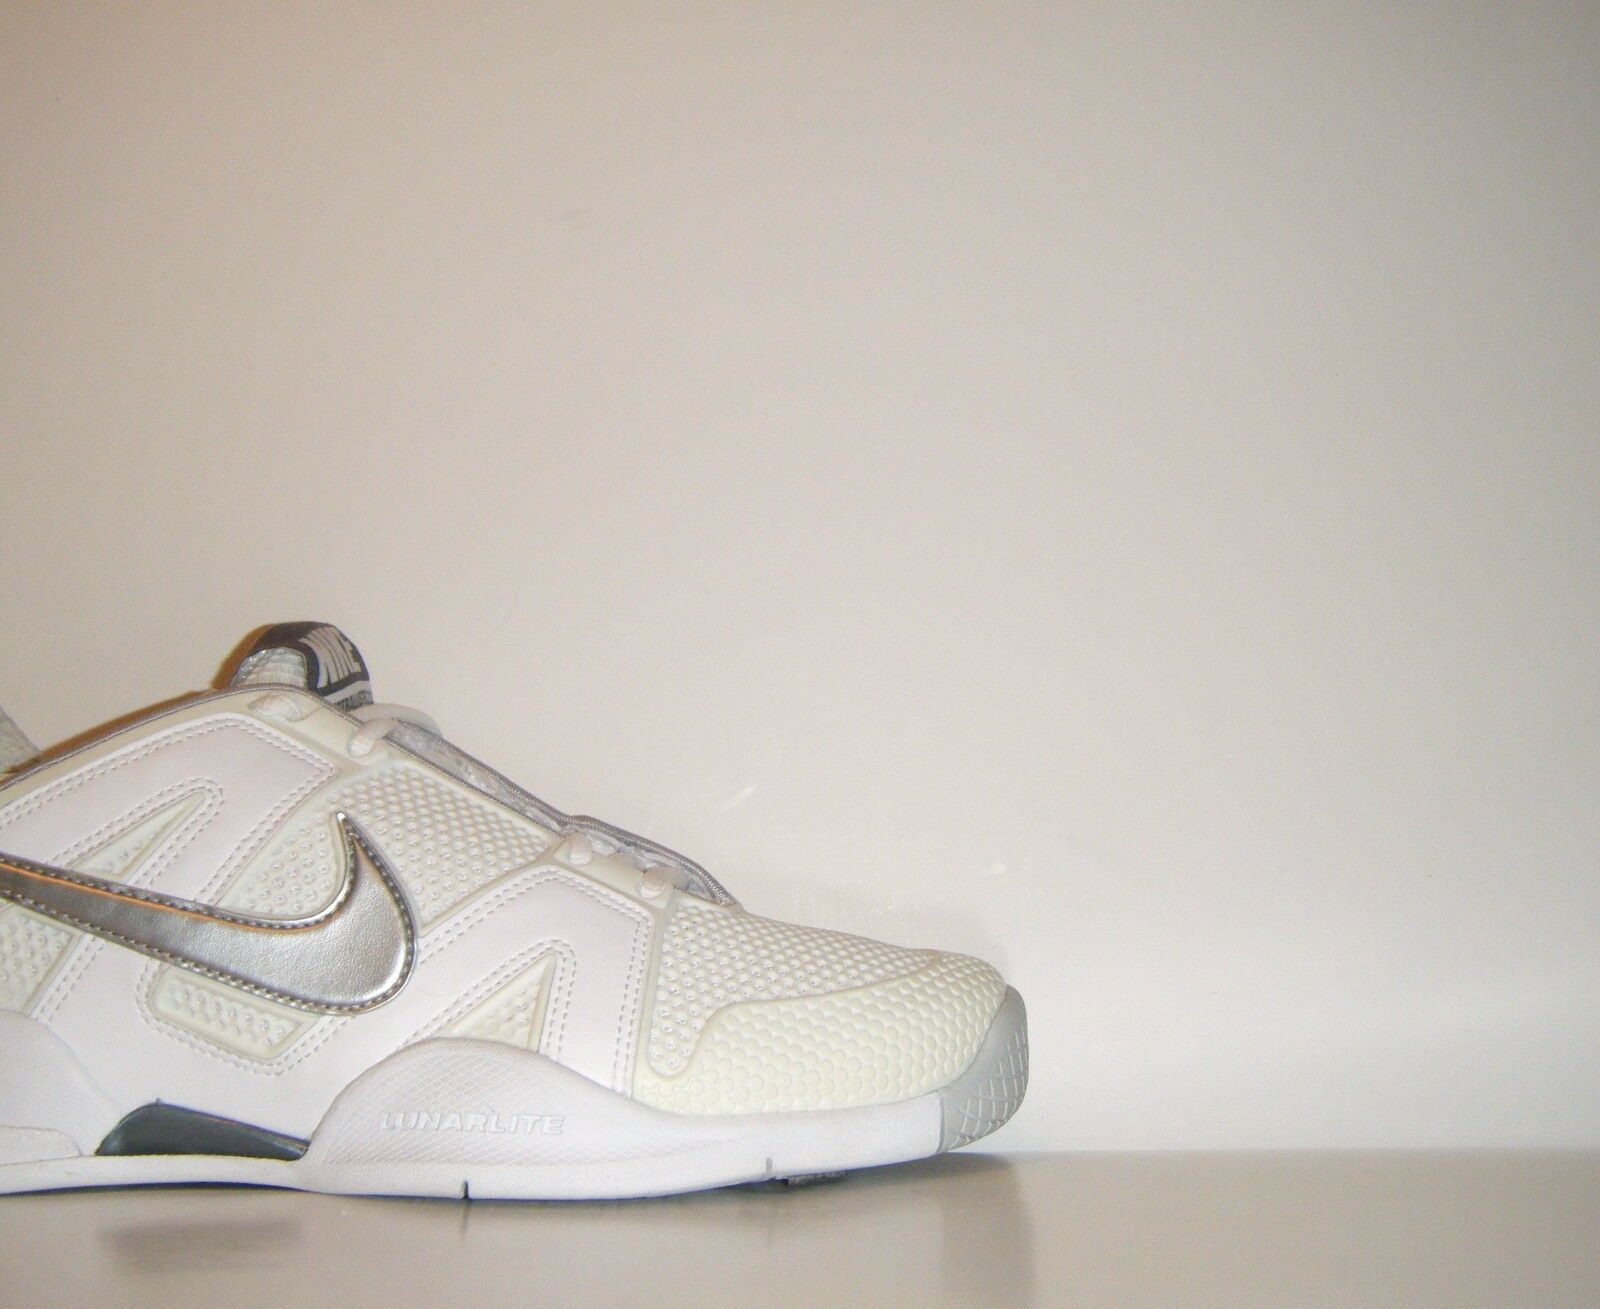 Womens Nike Air Max CourtBallistec 2.3 Tennis Sz. 8.5 Rafa Federer 386175-100